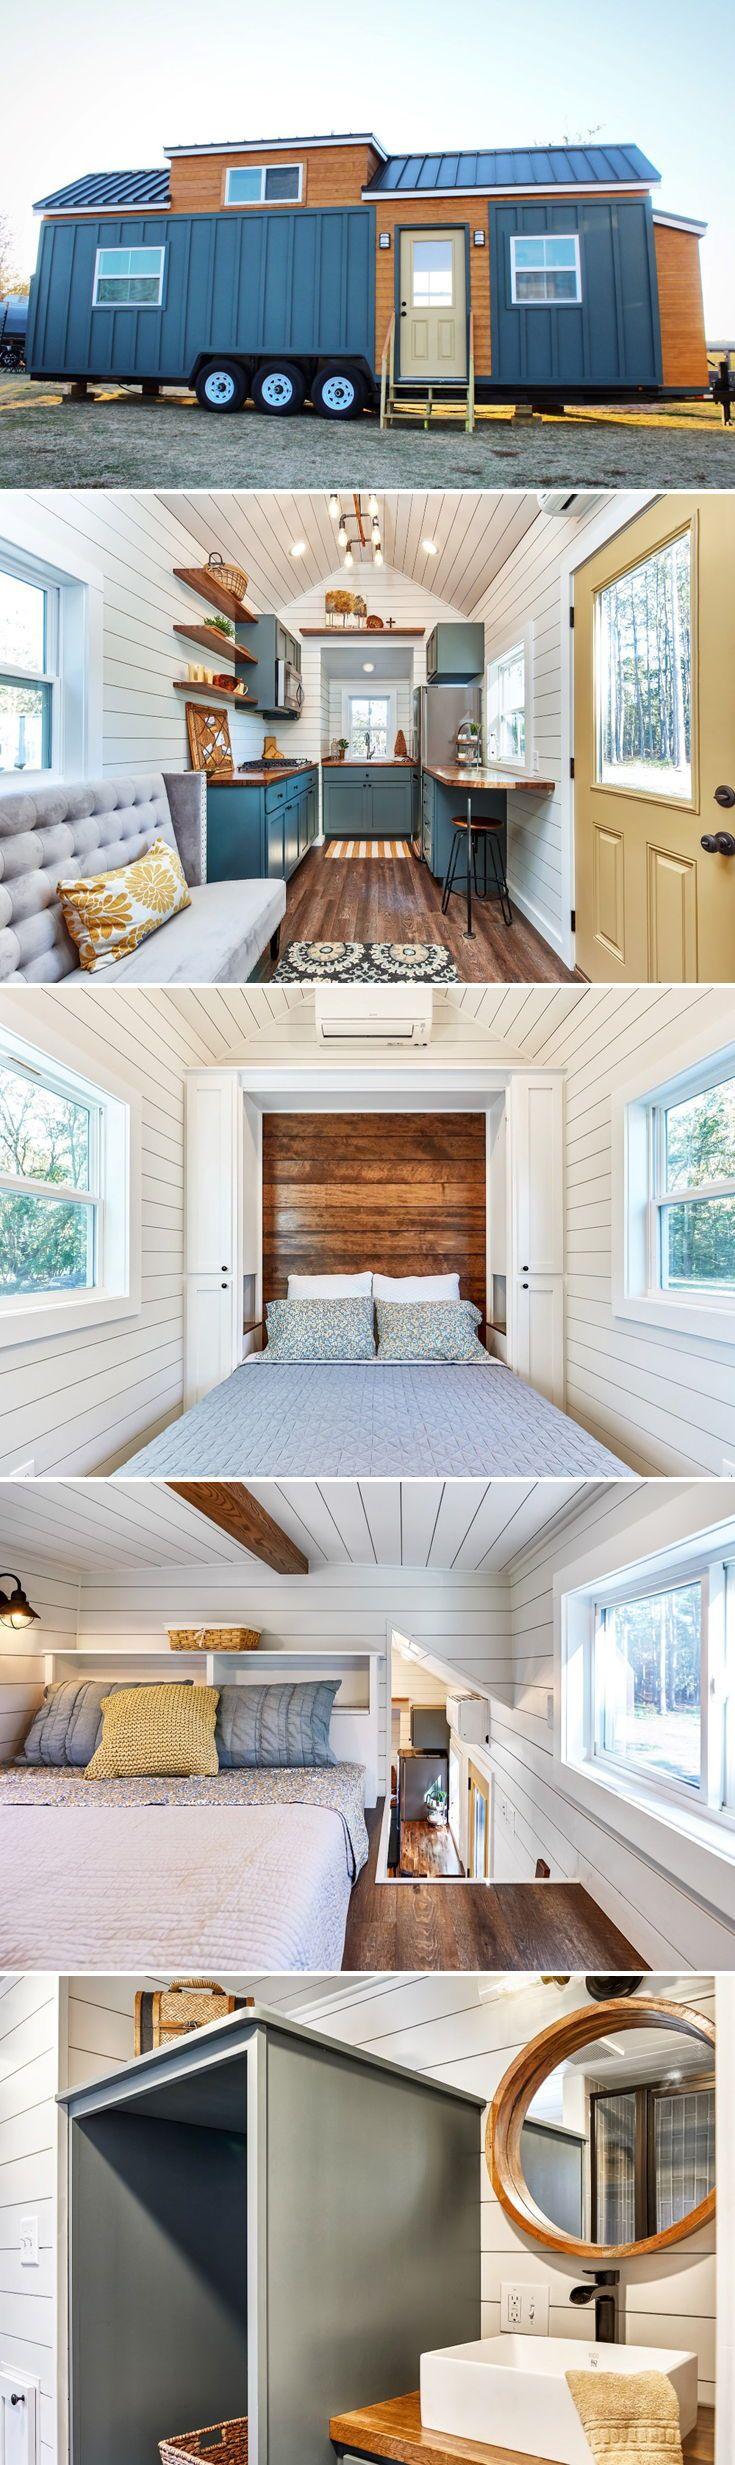 Best 25 Loft Office Ideas On Pinterest Loft Room